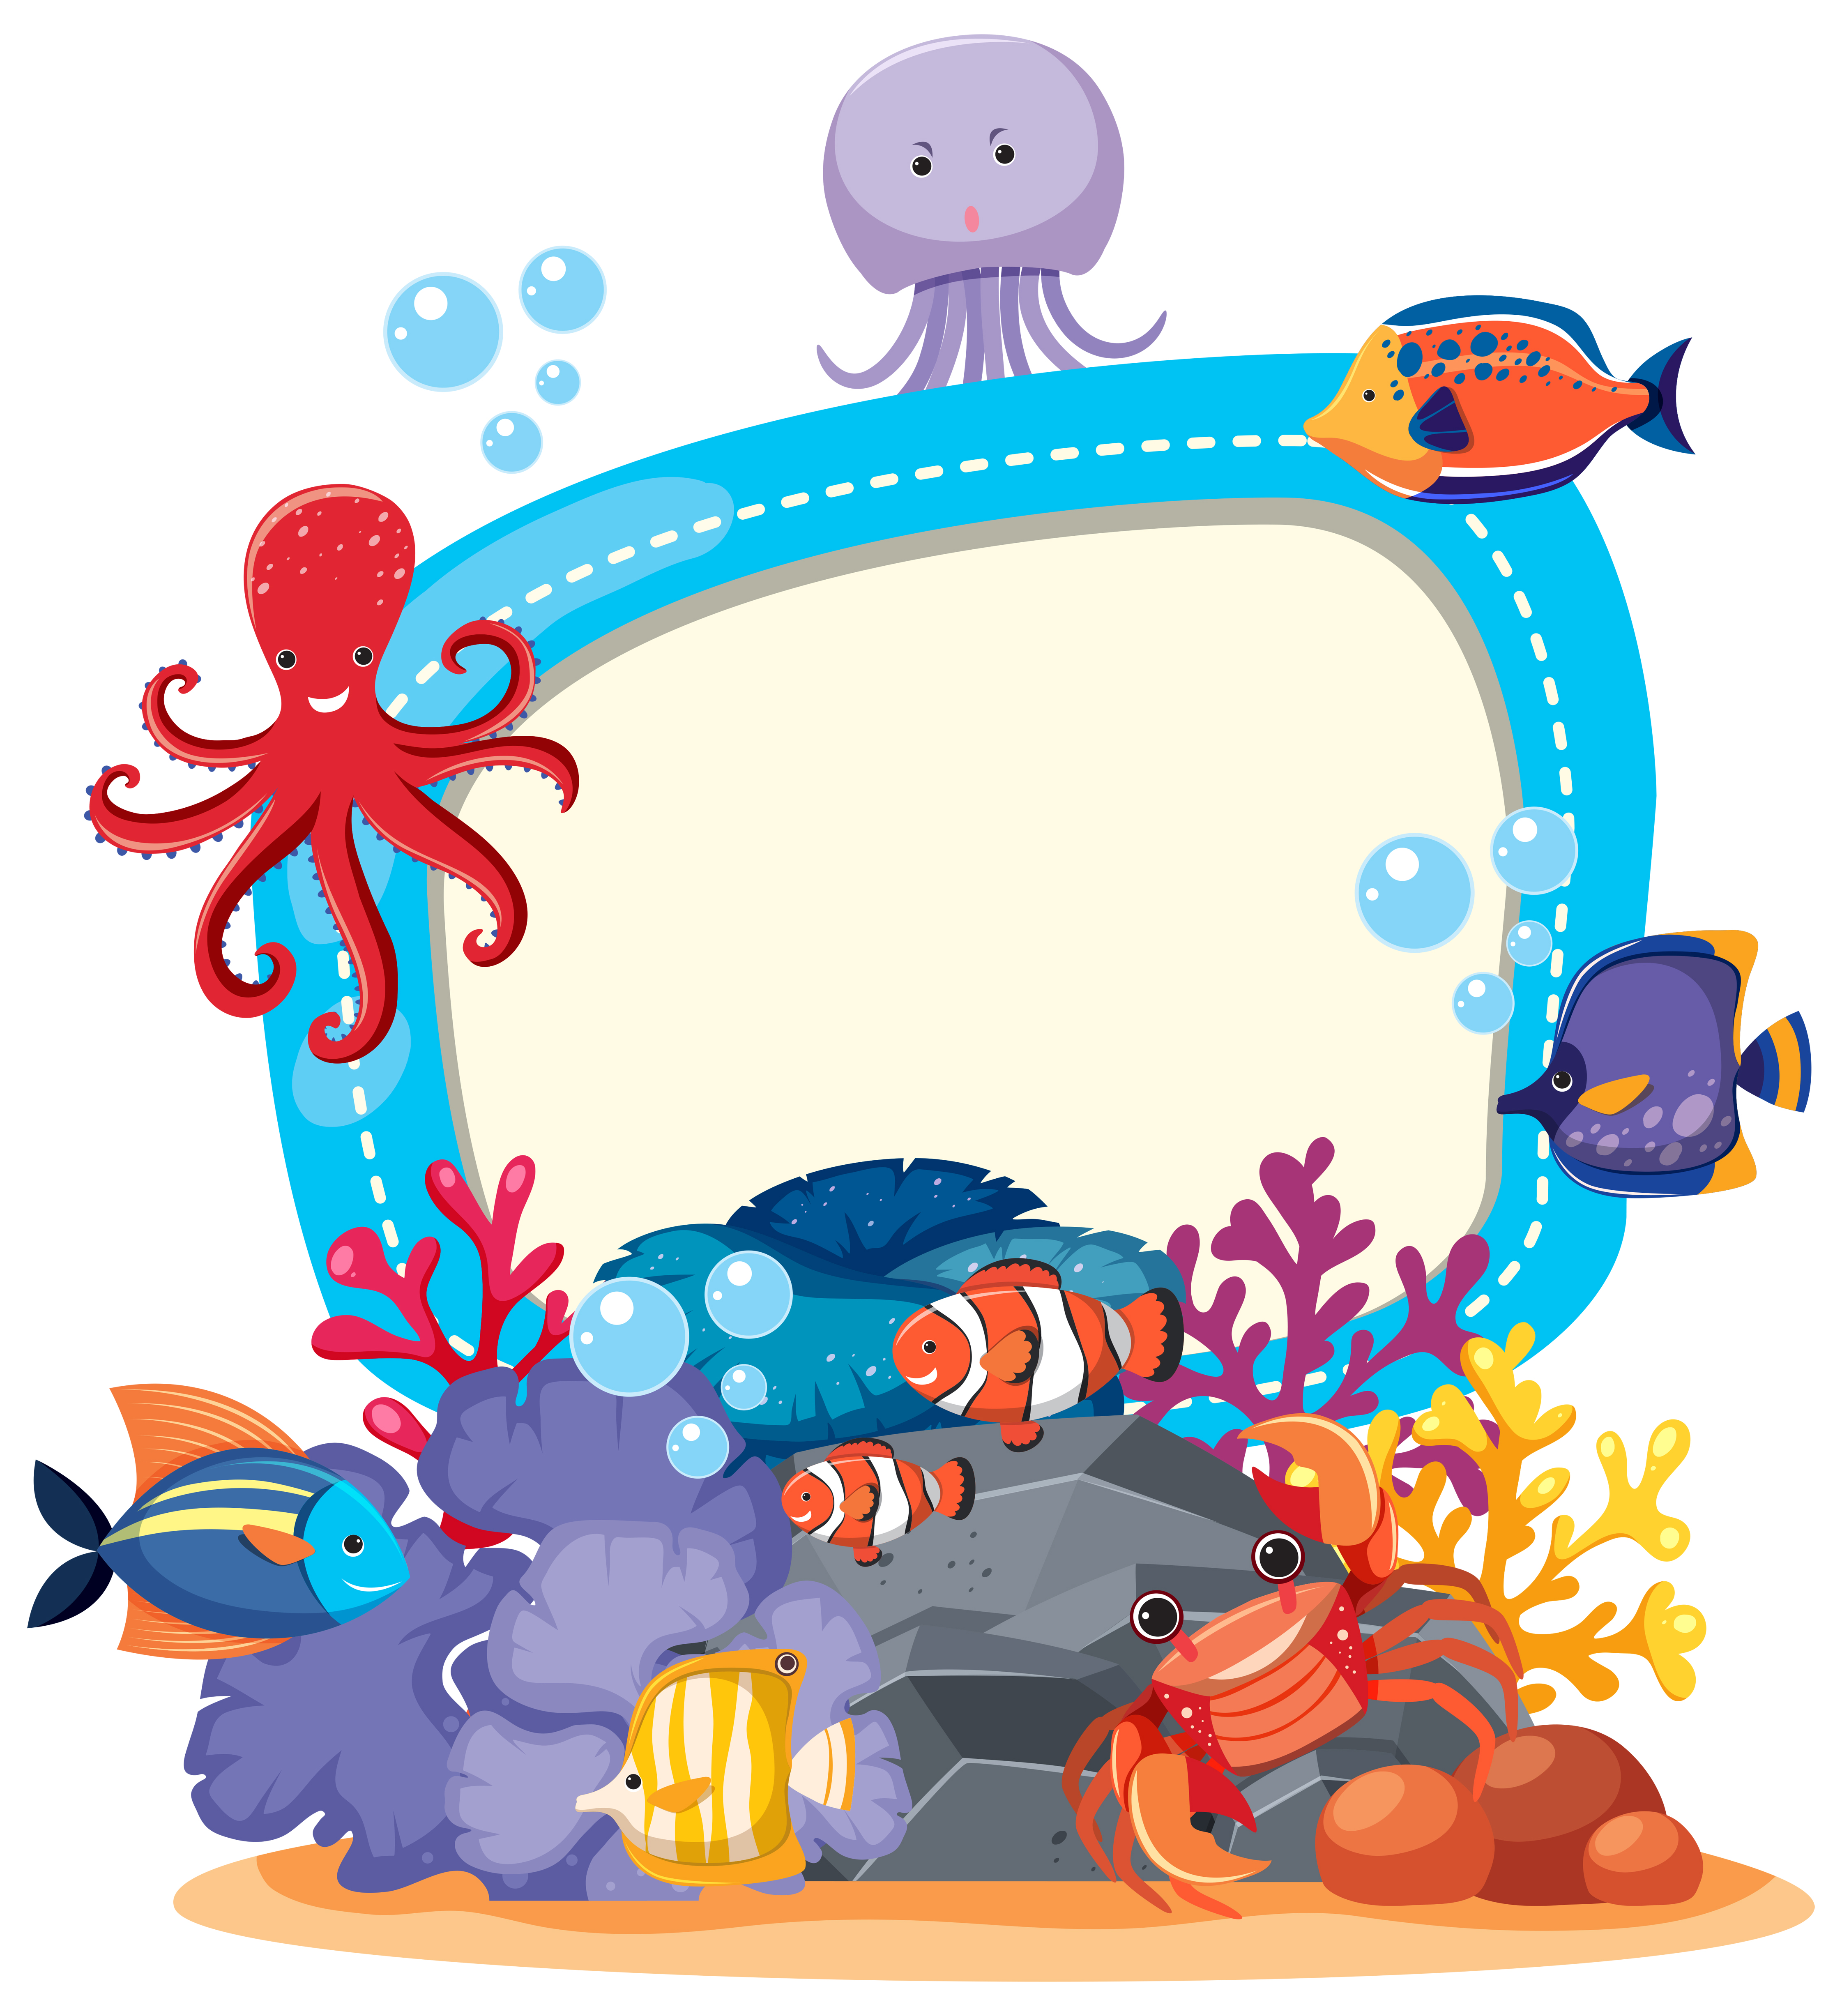 Border Template With Cute Sea Animals Download Free Vectors Clipart Graphics Vector Art